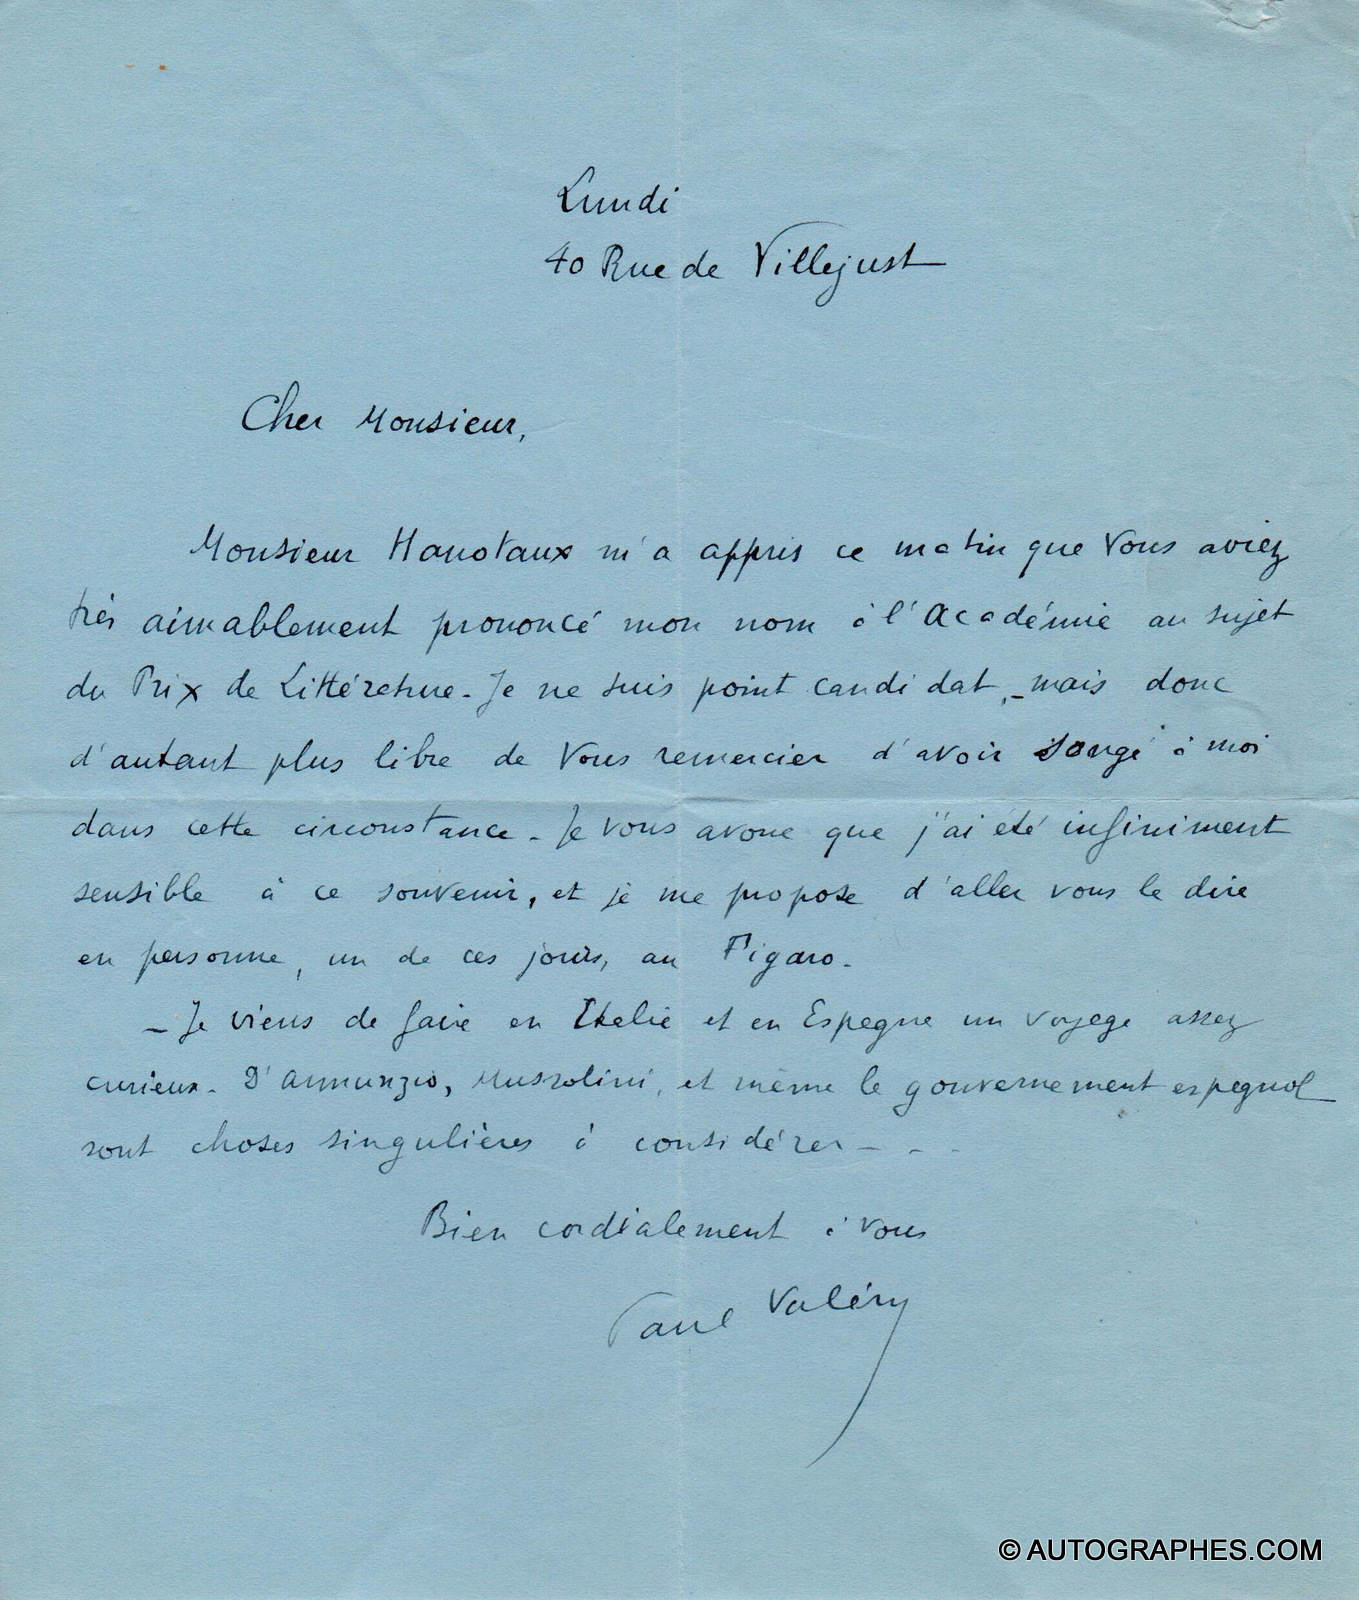 lettre-autographe-signee-paul-valery-d-annunzio-mussolini